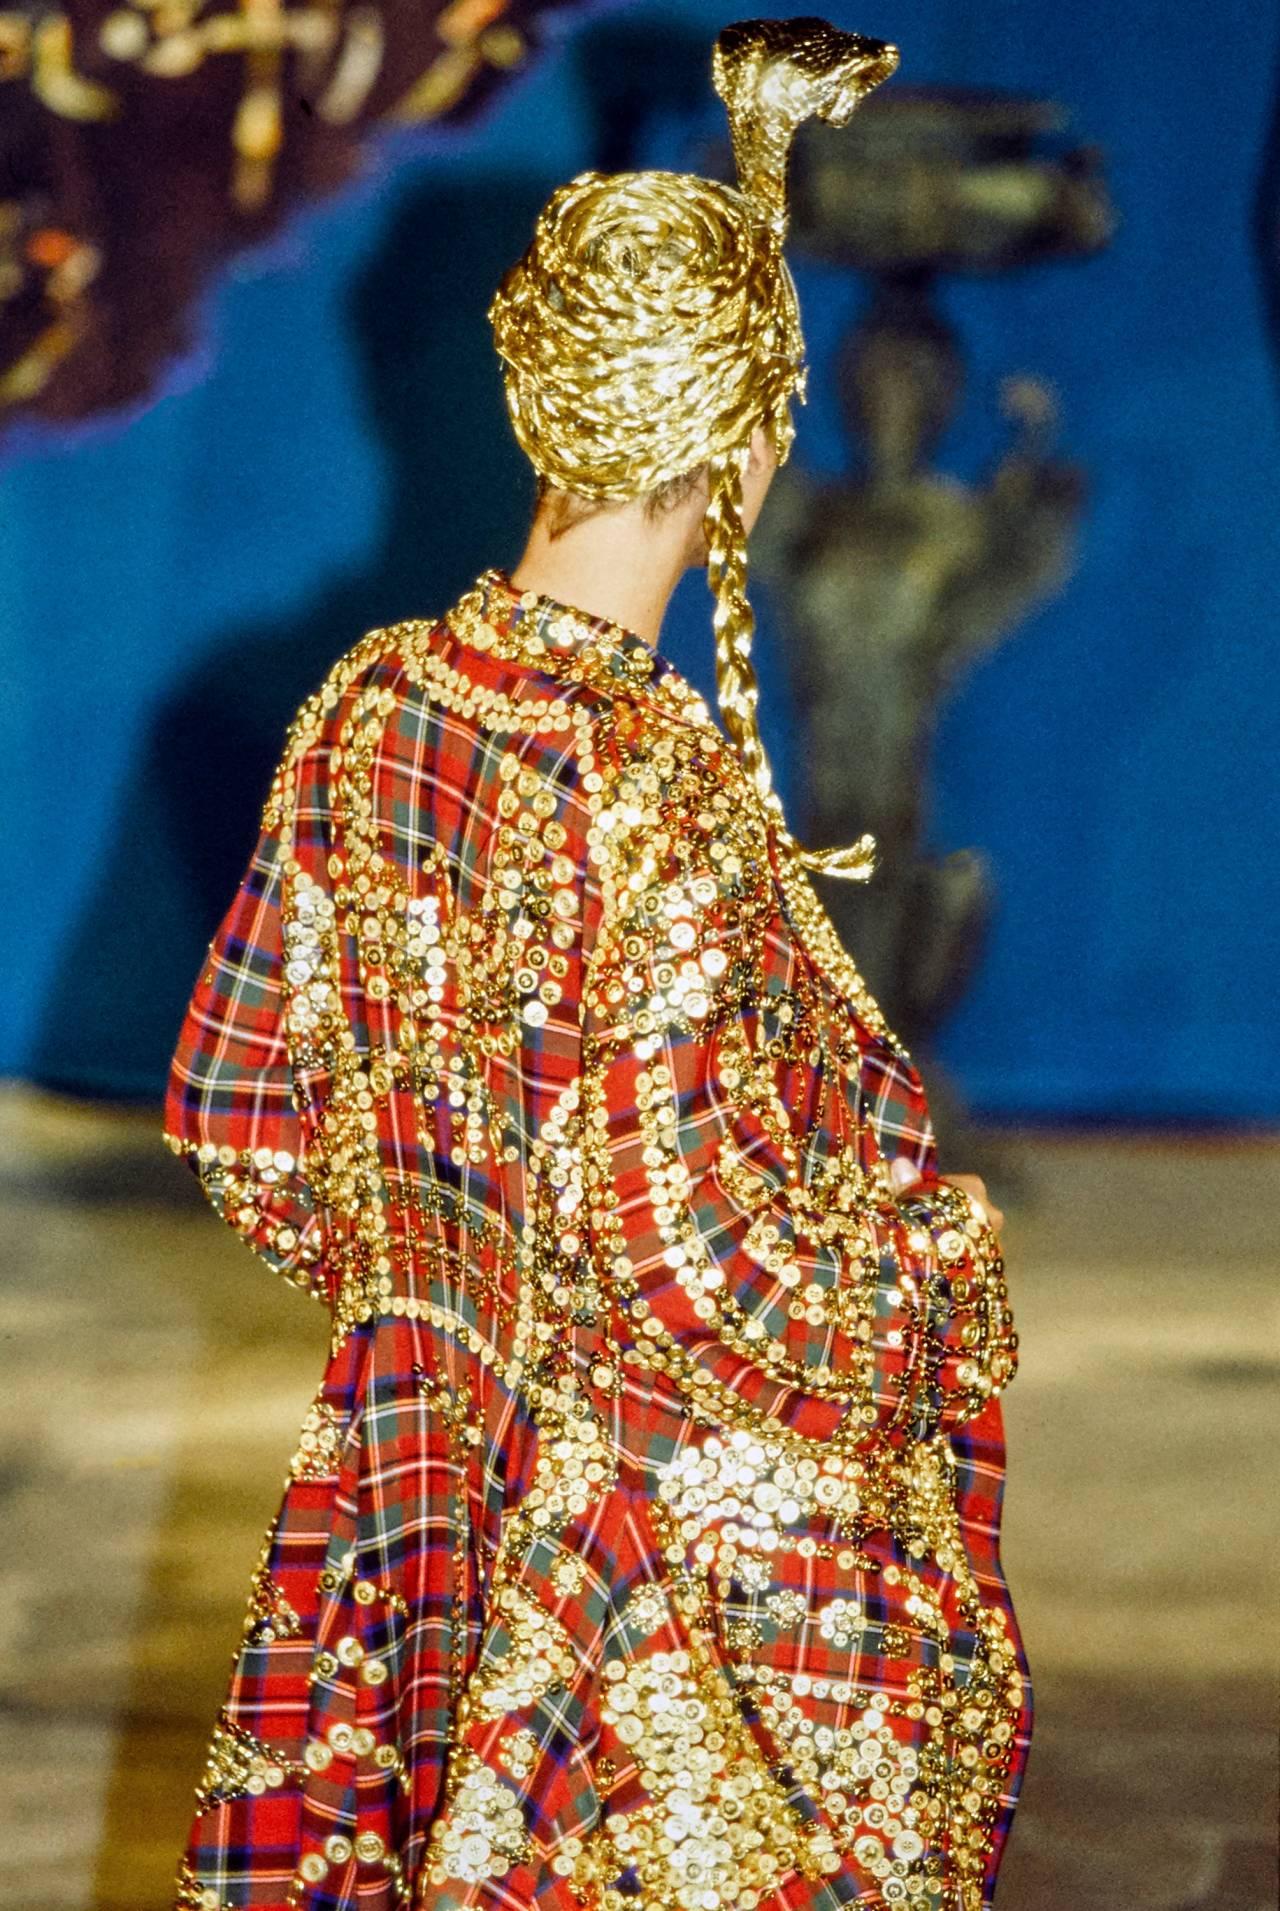 John Galliano - Fall 1997 RTW #fashion#fashion show#john galliano #fall 1997 rtw #1997#linda evangelista#supermodel#original supermodels#supermodels#90s#90s aesthetic#90s fashion#runway#model#models#beautiful#haute couture#couture#glamour#paris#milan#london #new york city